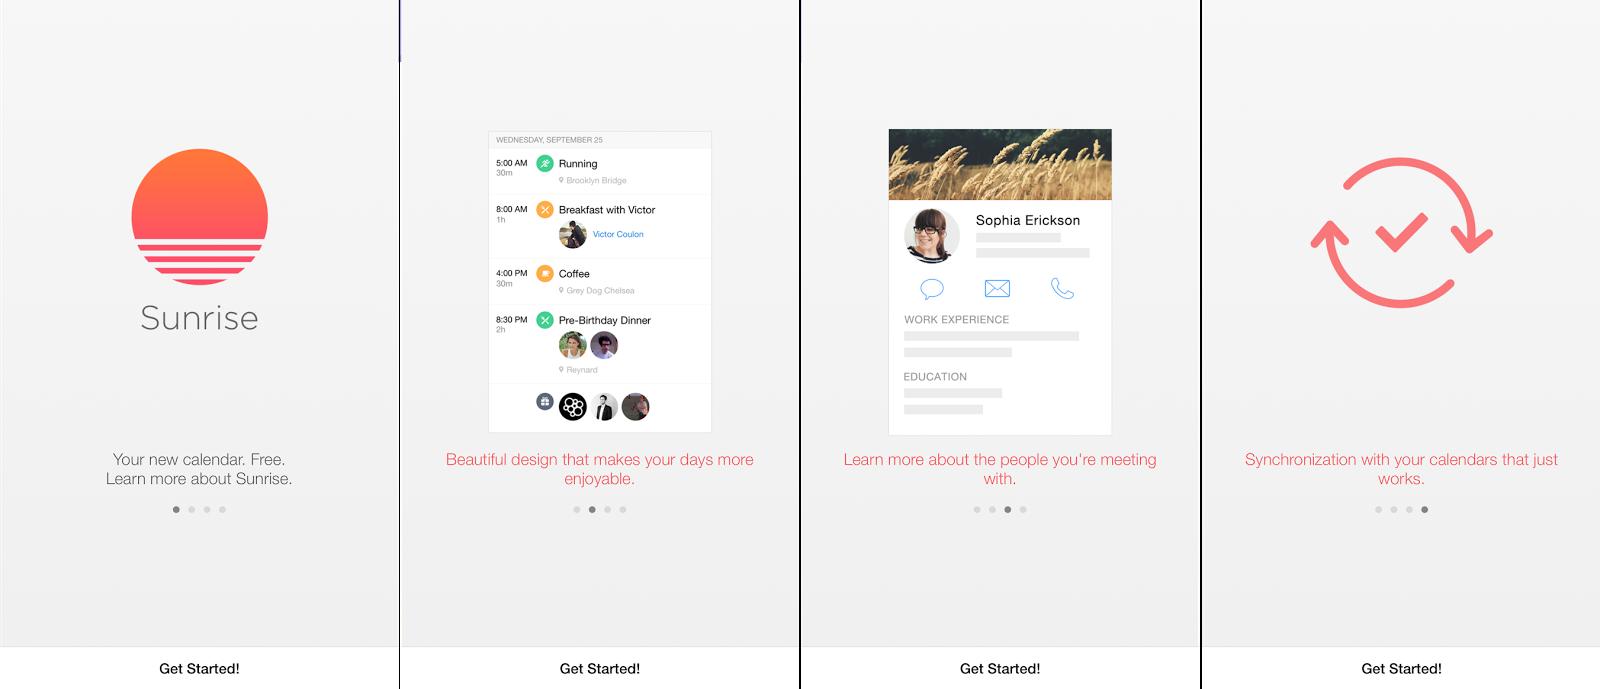 Android News, Iphone News, Samsung News, Apk, Google Play